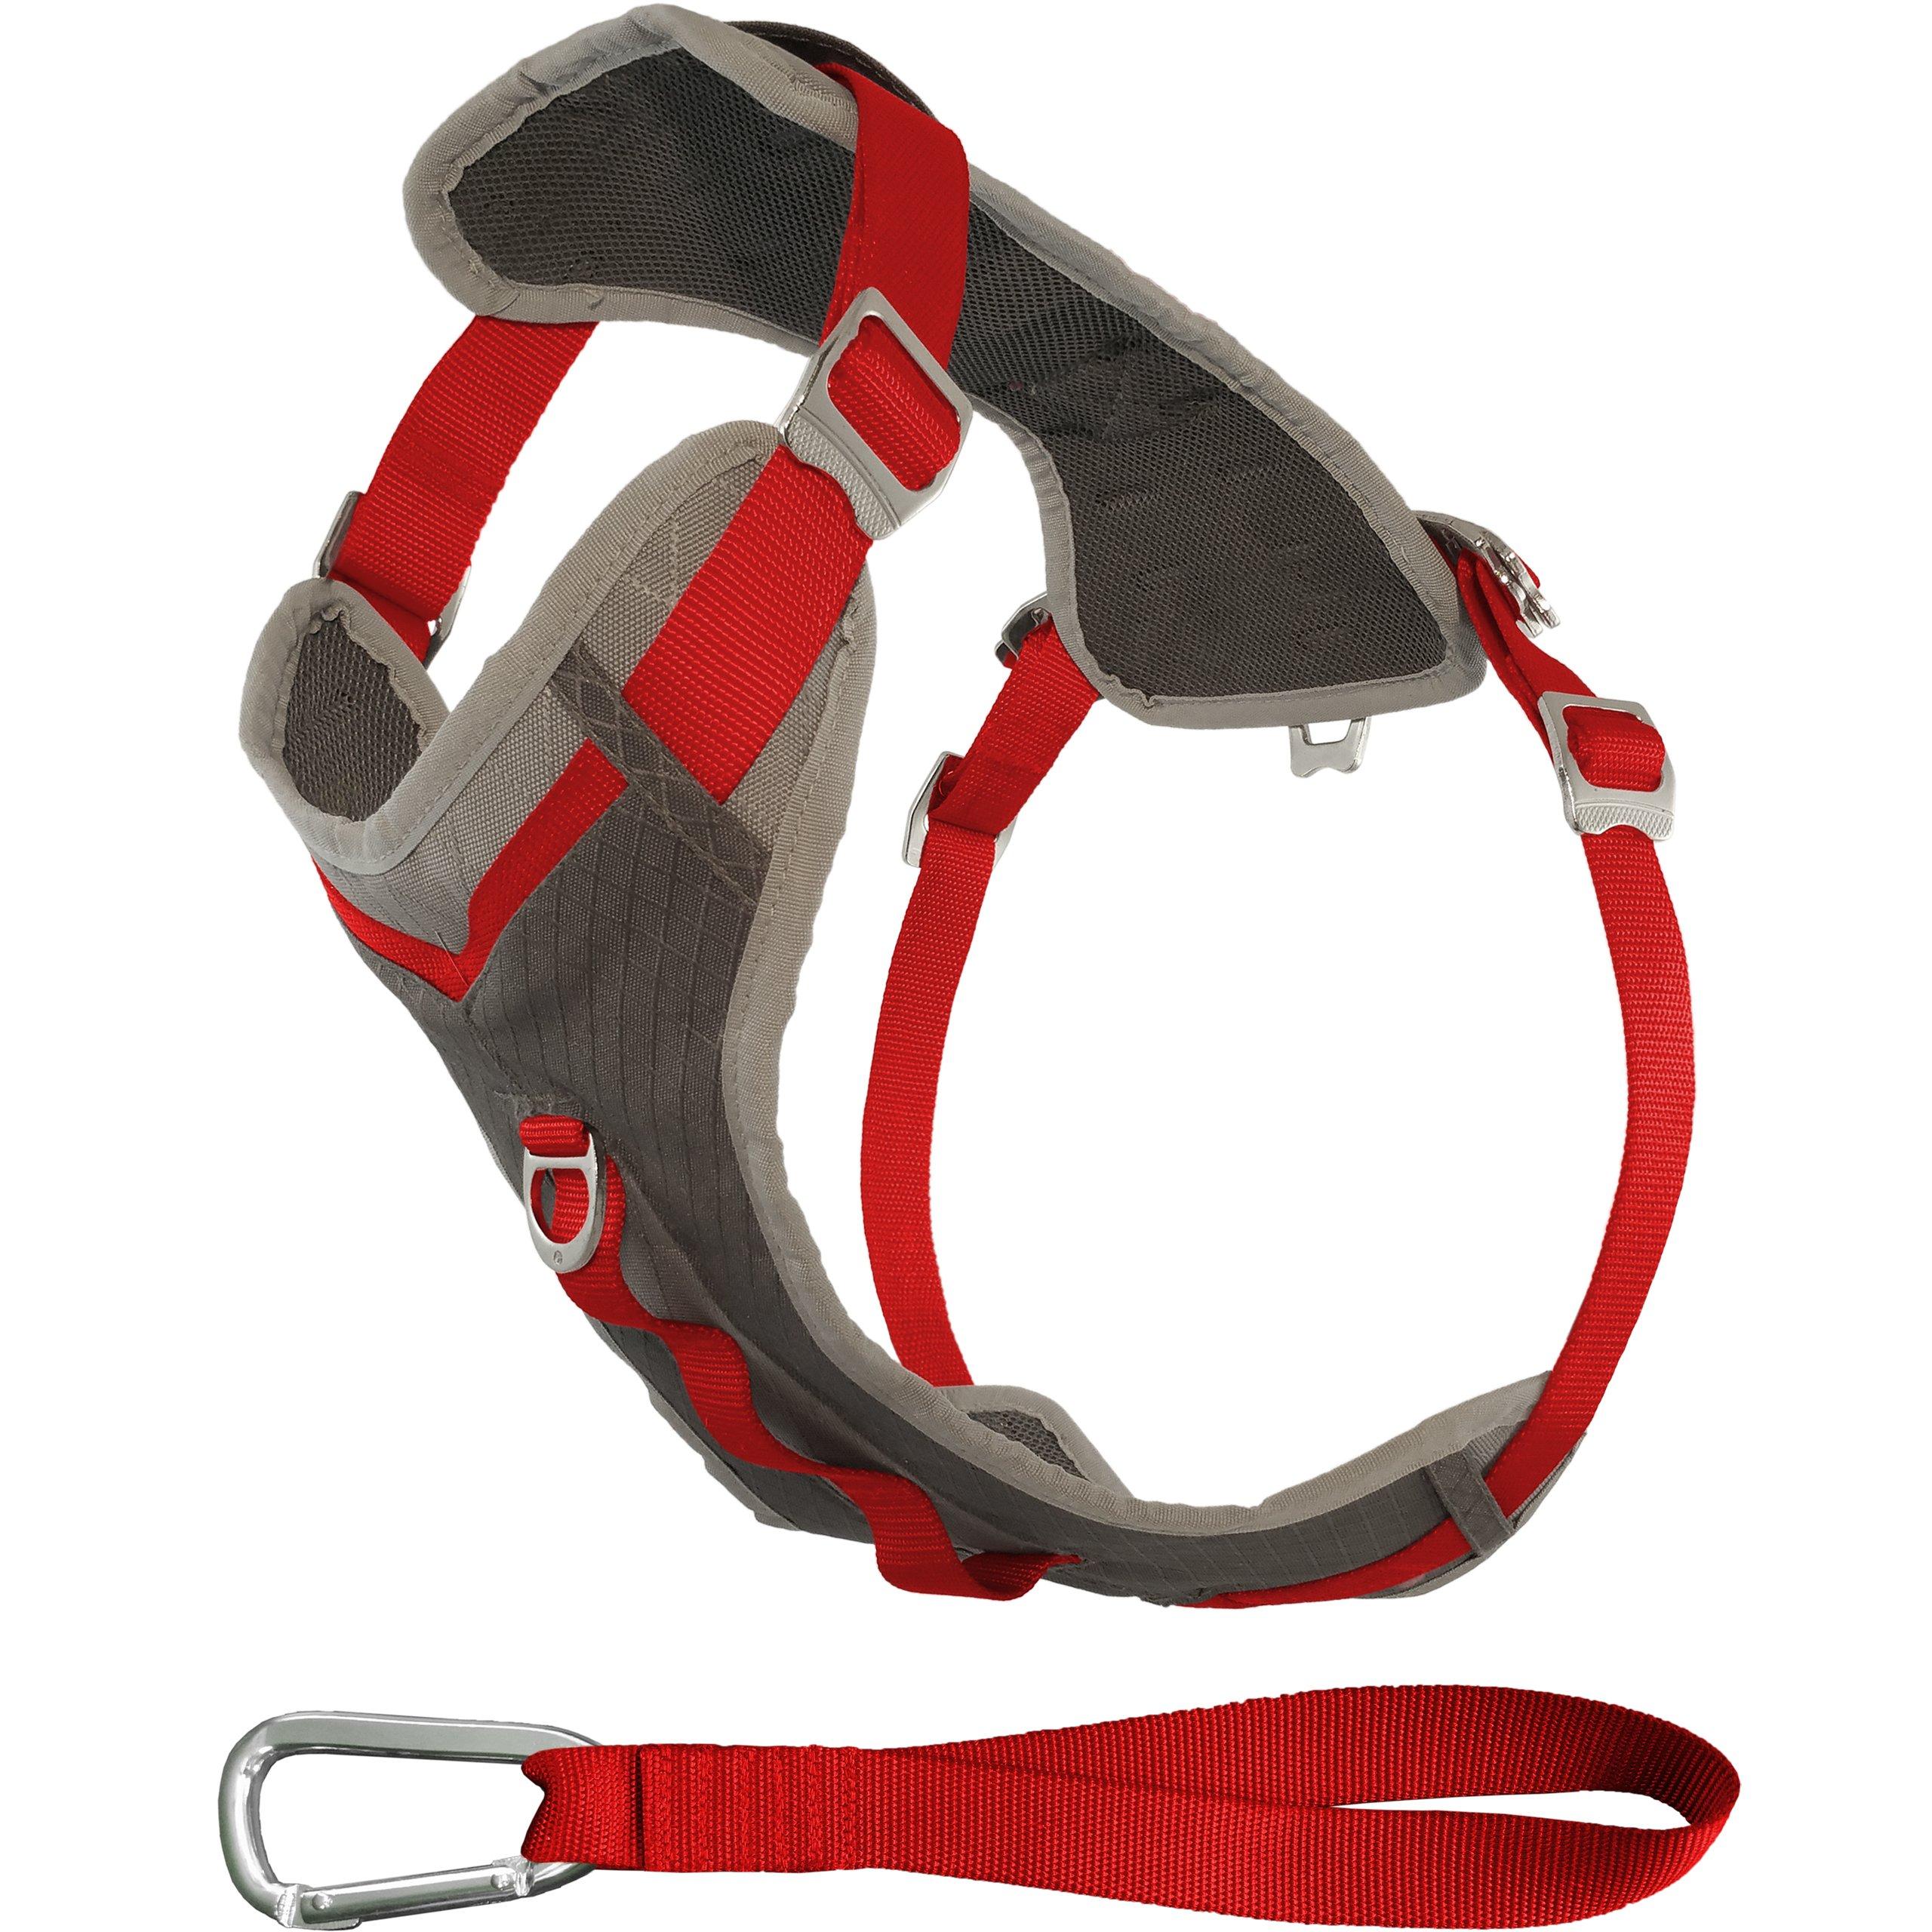 Kurgo Journey Multi-Use Dog Harness, Reflective Harness, Dog Running Harness, Dog Walking Harness, Dog Hiking Harness, Red/Grey, X-Large